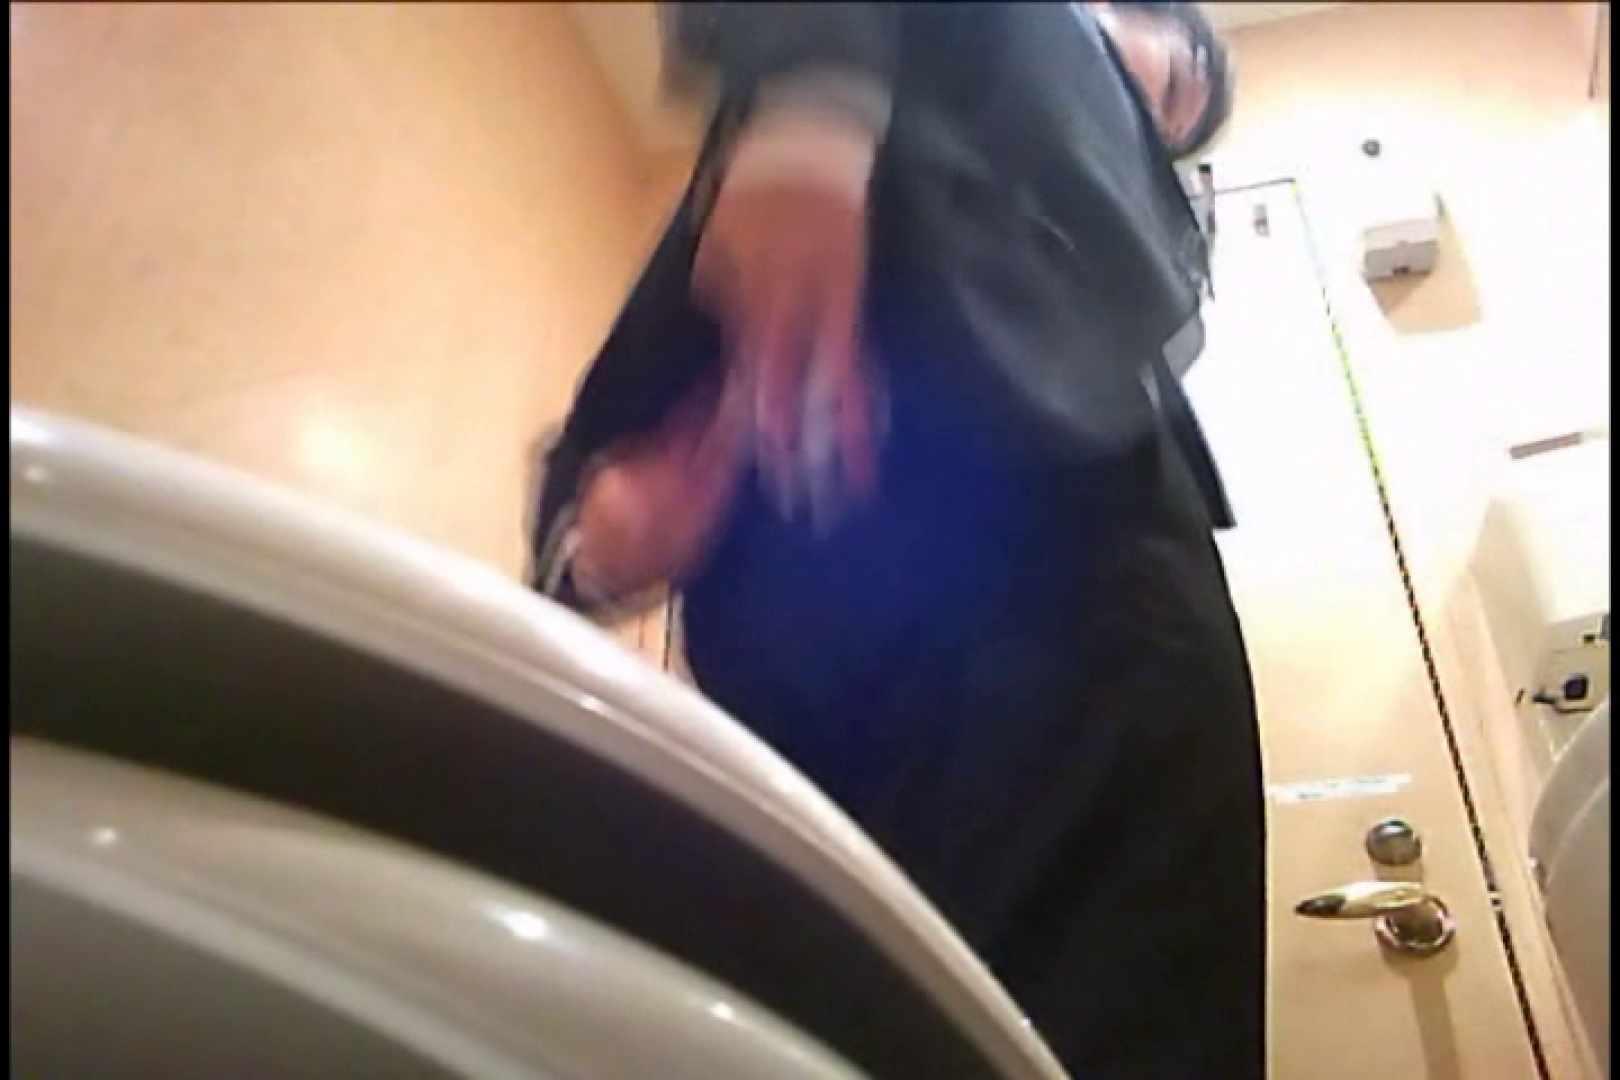 Gボーイ初投稿!掴み取りさんの洗面所覗き!in新幹線!VOL.05 投稿 ゲイエロ動画 96枚 35